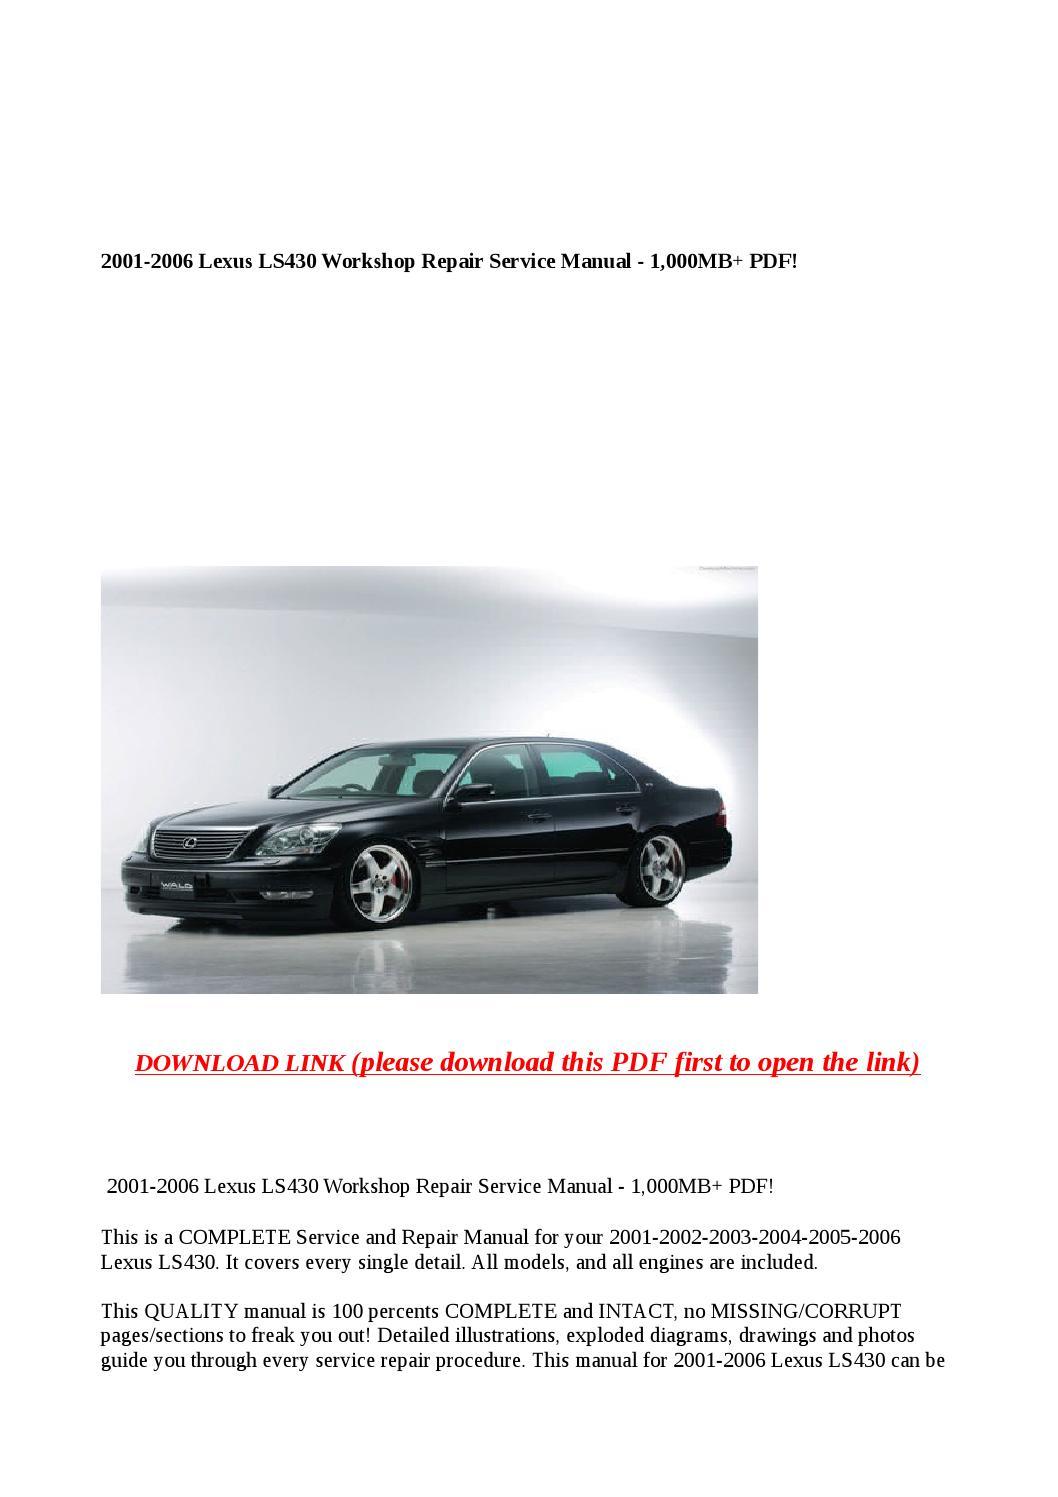 hight resolution of 2001 2006 lexus ls430 workshop repair service manual 1 000mb pdf